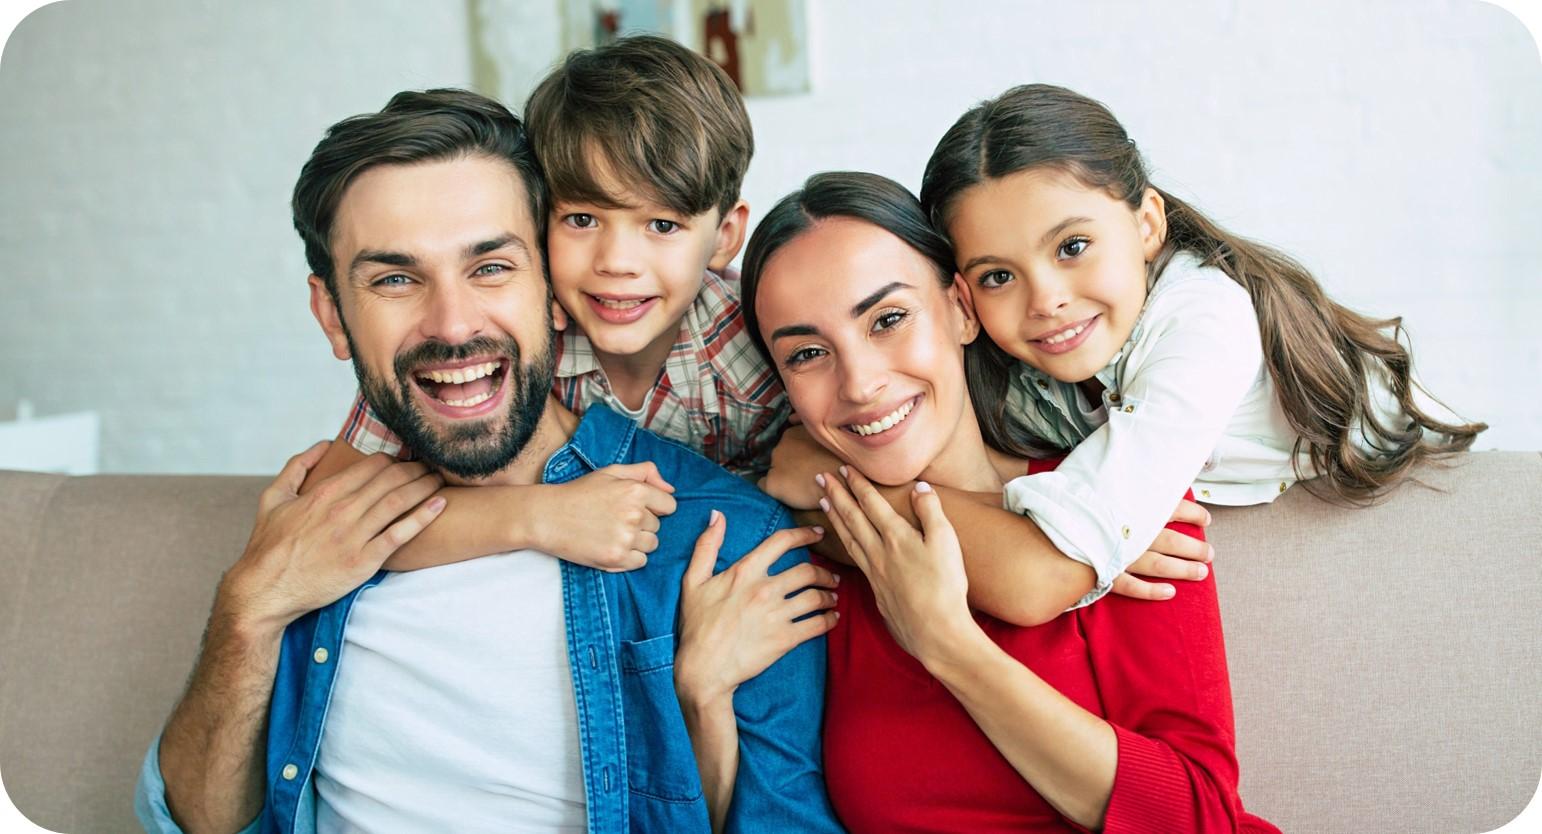 DebtWave Credit Counseling